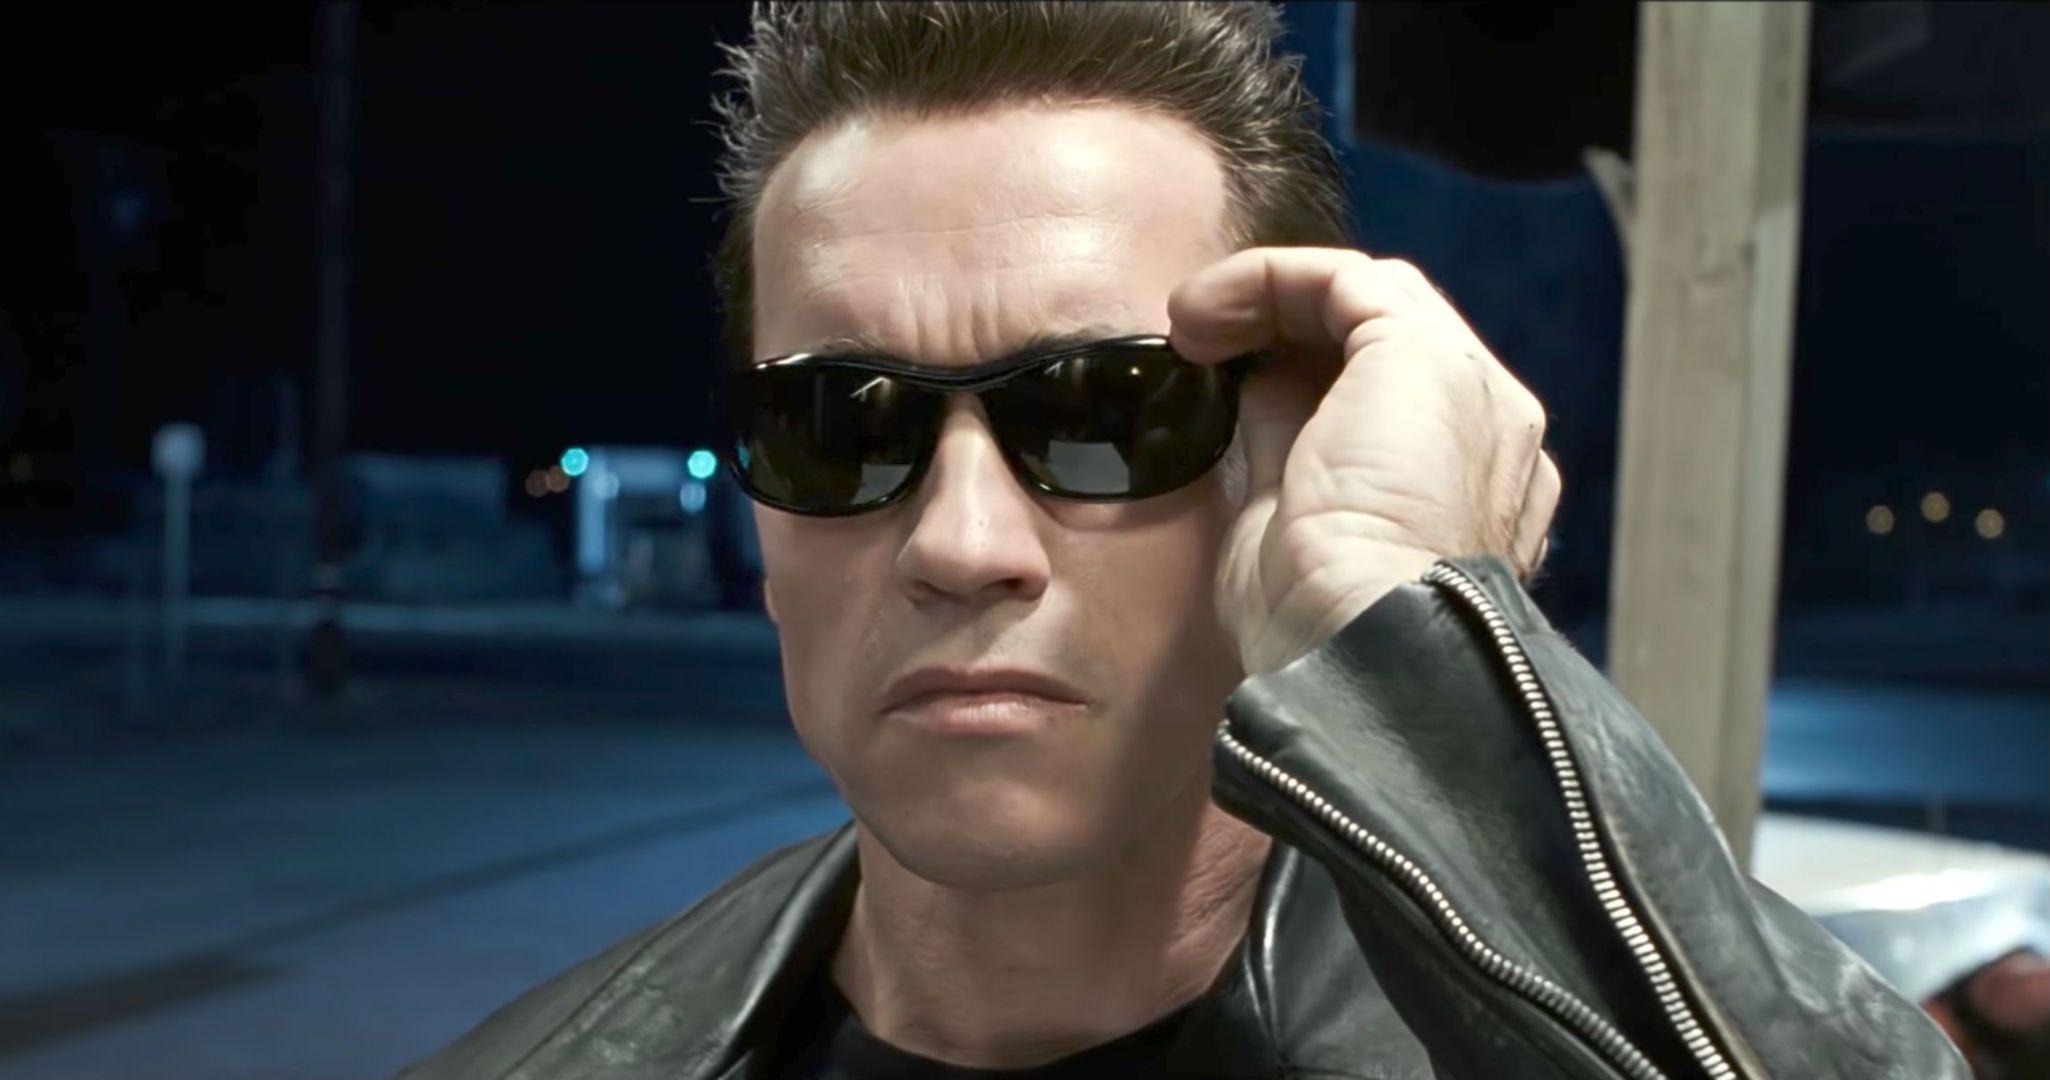 How to watch Terminator 2 Judgement Day online ahead of Terminator: Dark Fate release